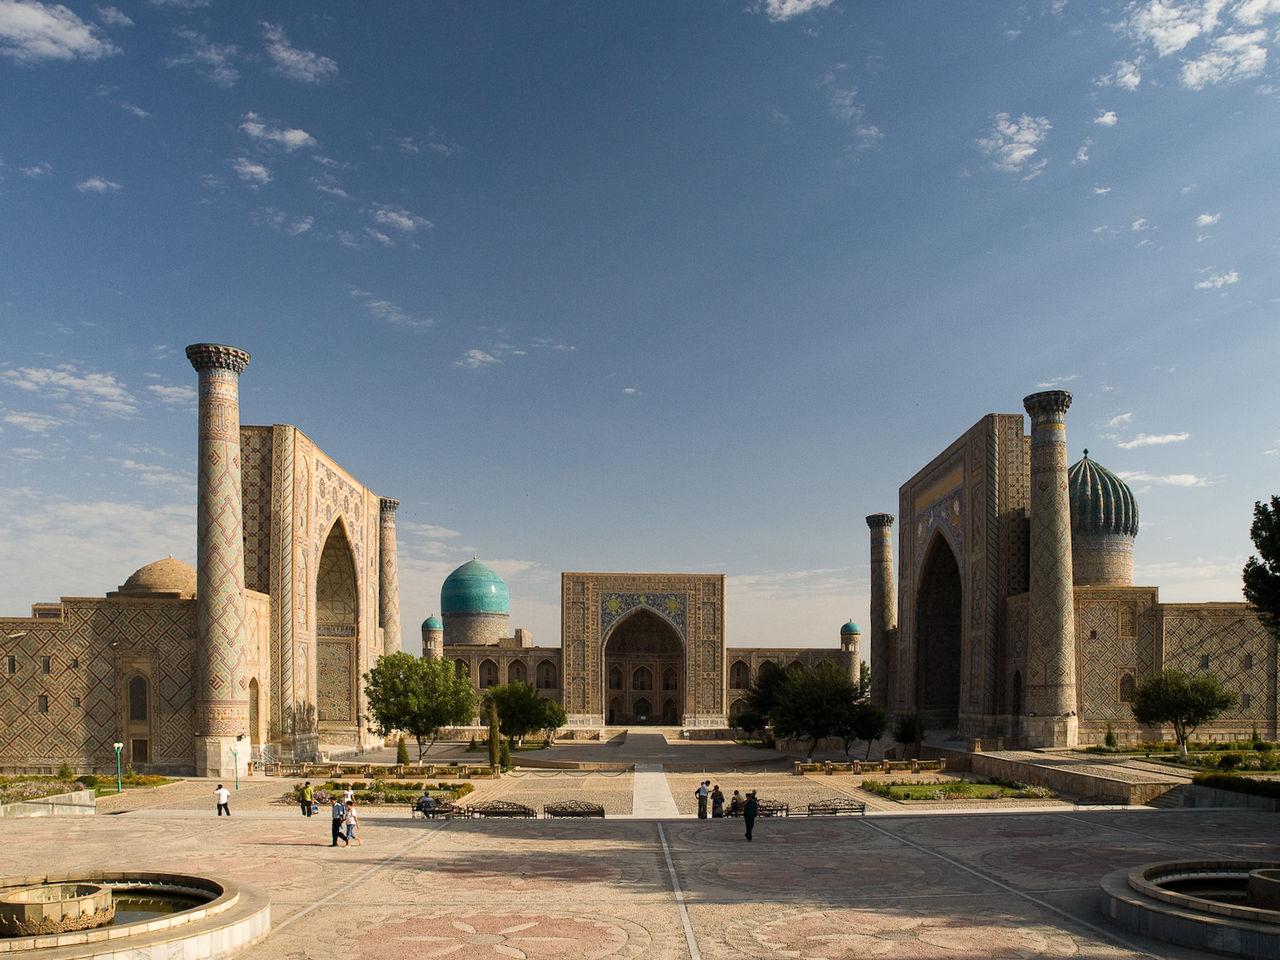 RegistanSquareWHS_Samarkand-Uzbekistan.jpg